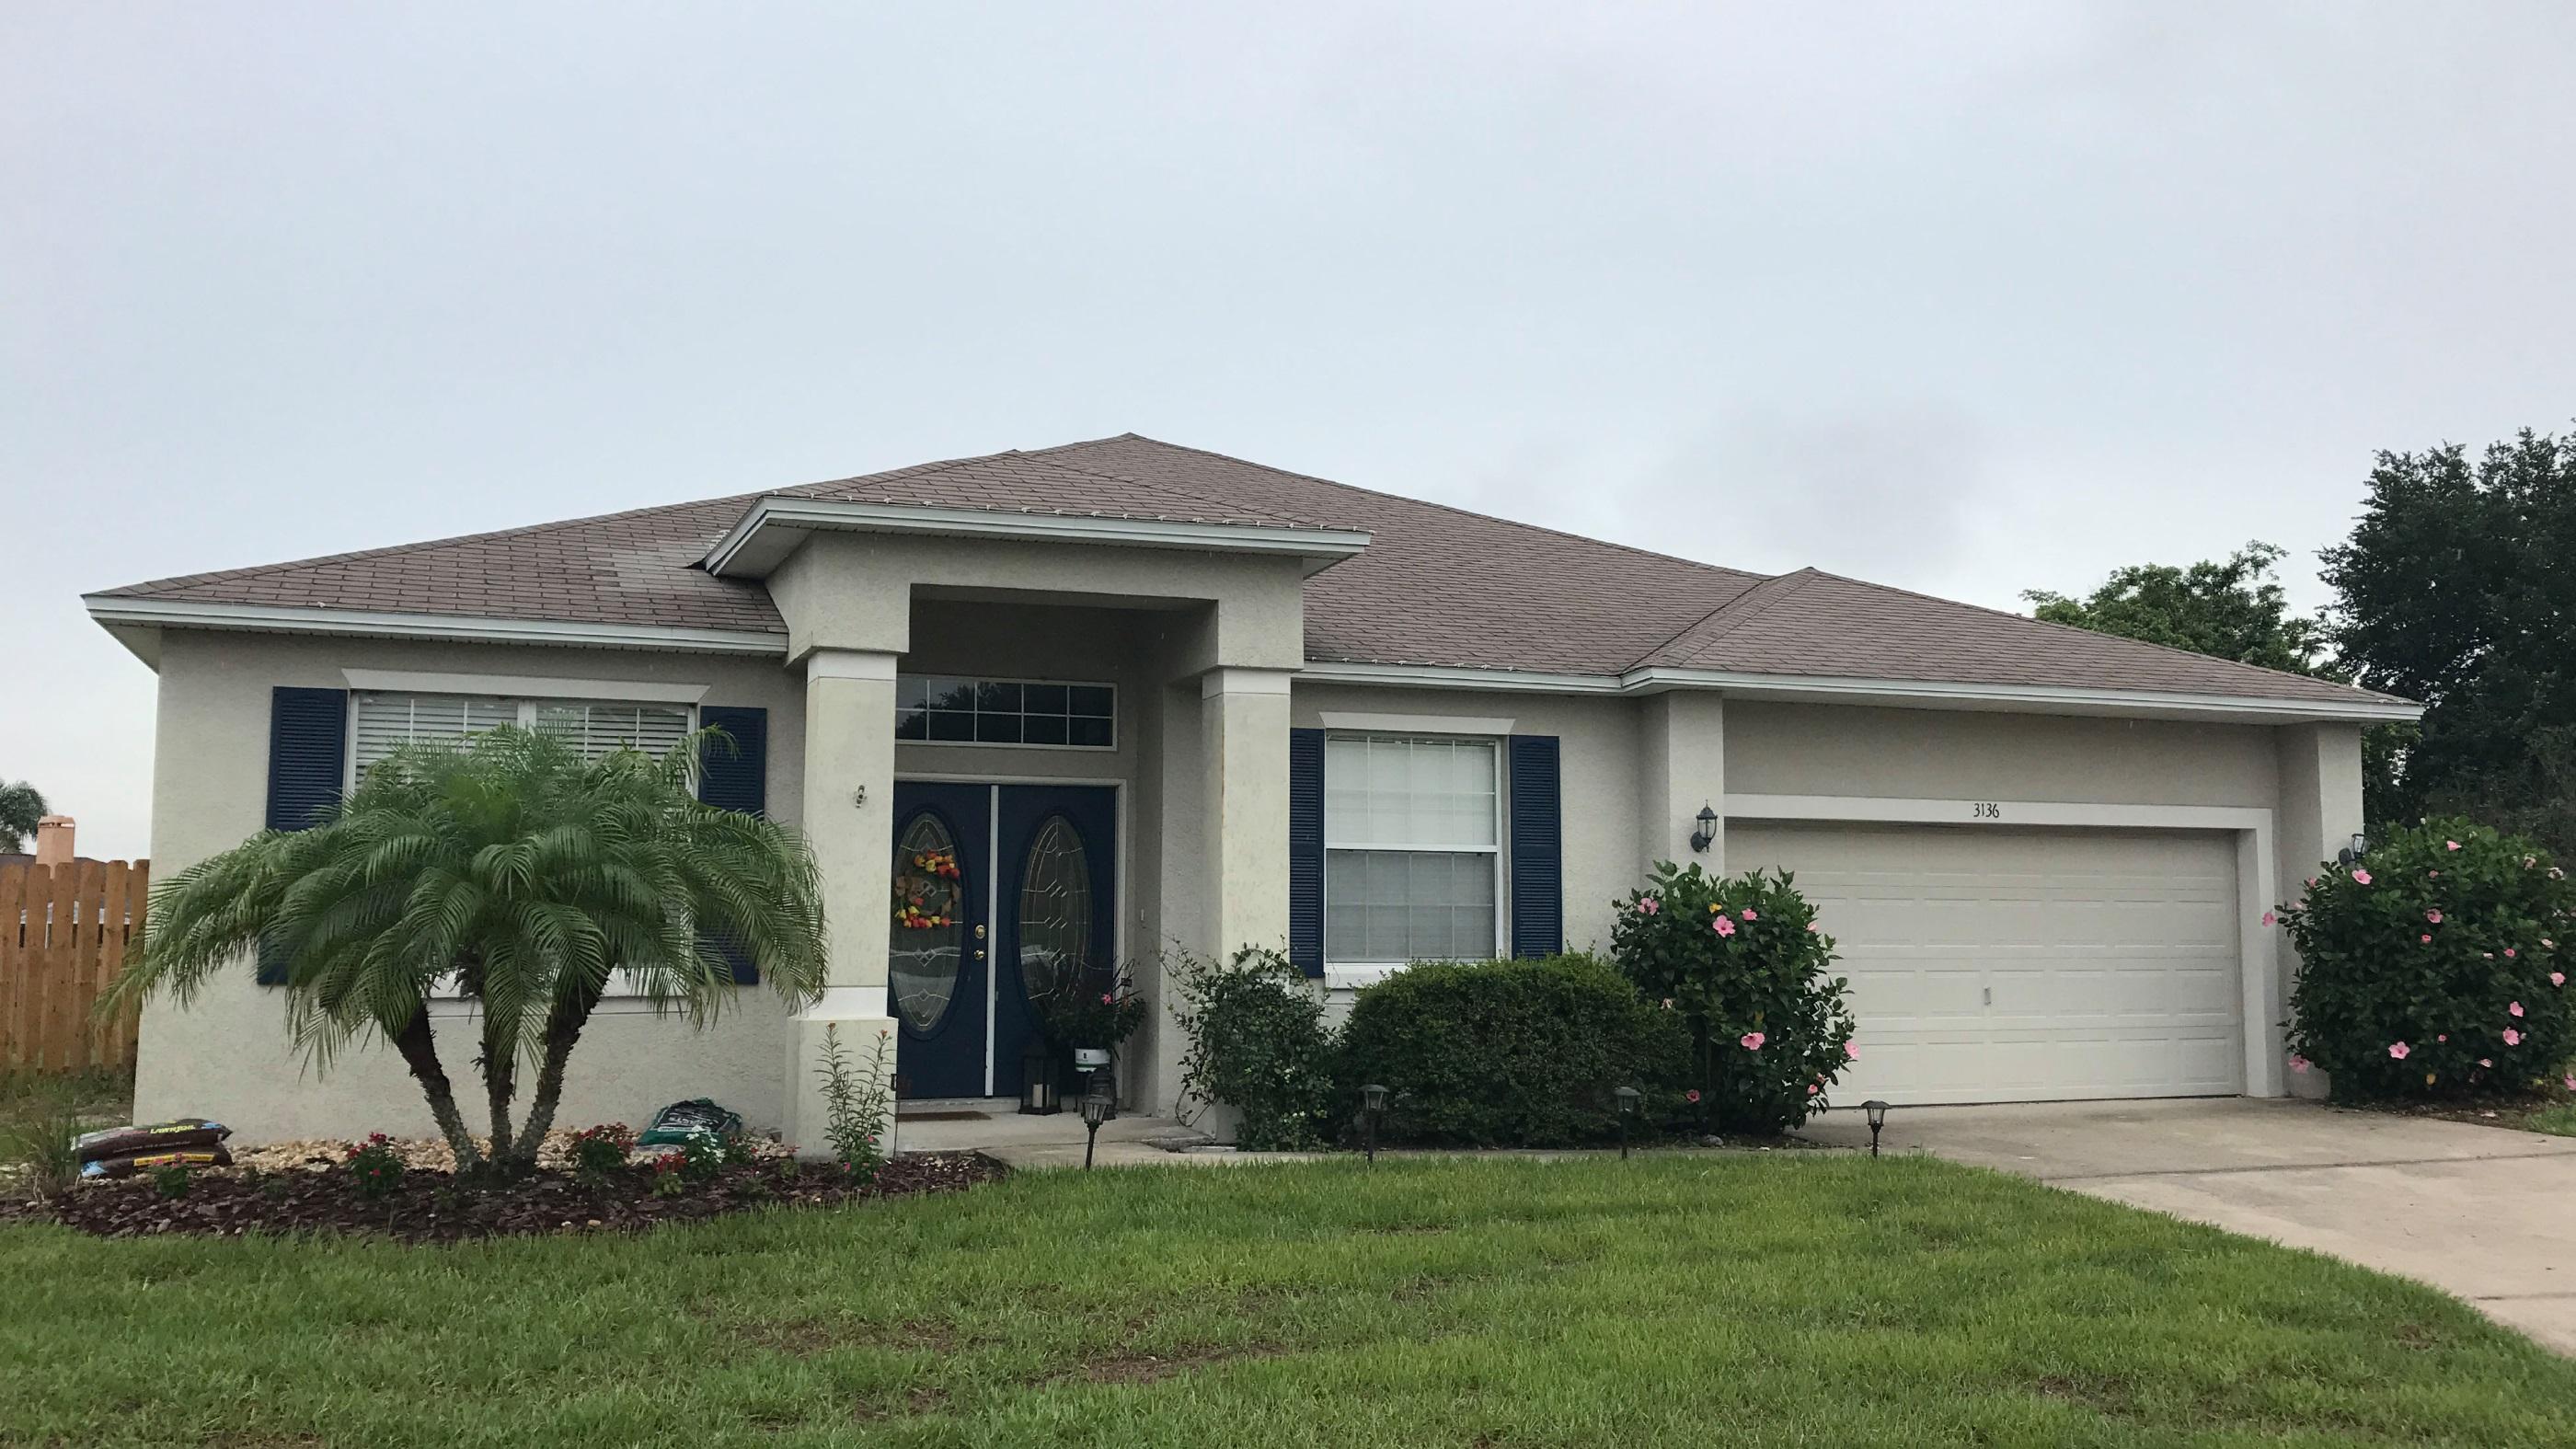 3136 otto drive lakeland fl 33812 coming soon for Florida home designs lakeland fl